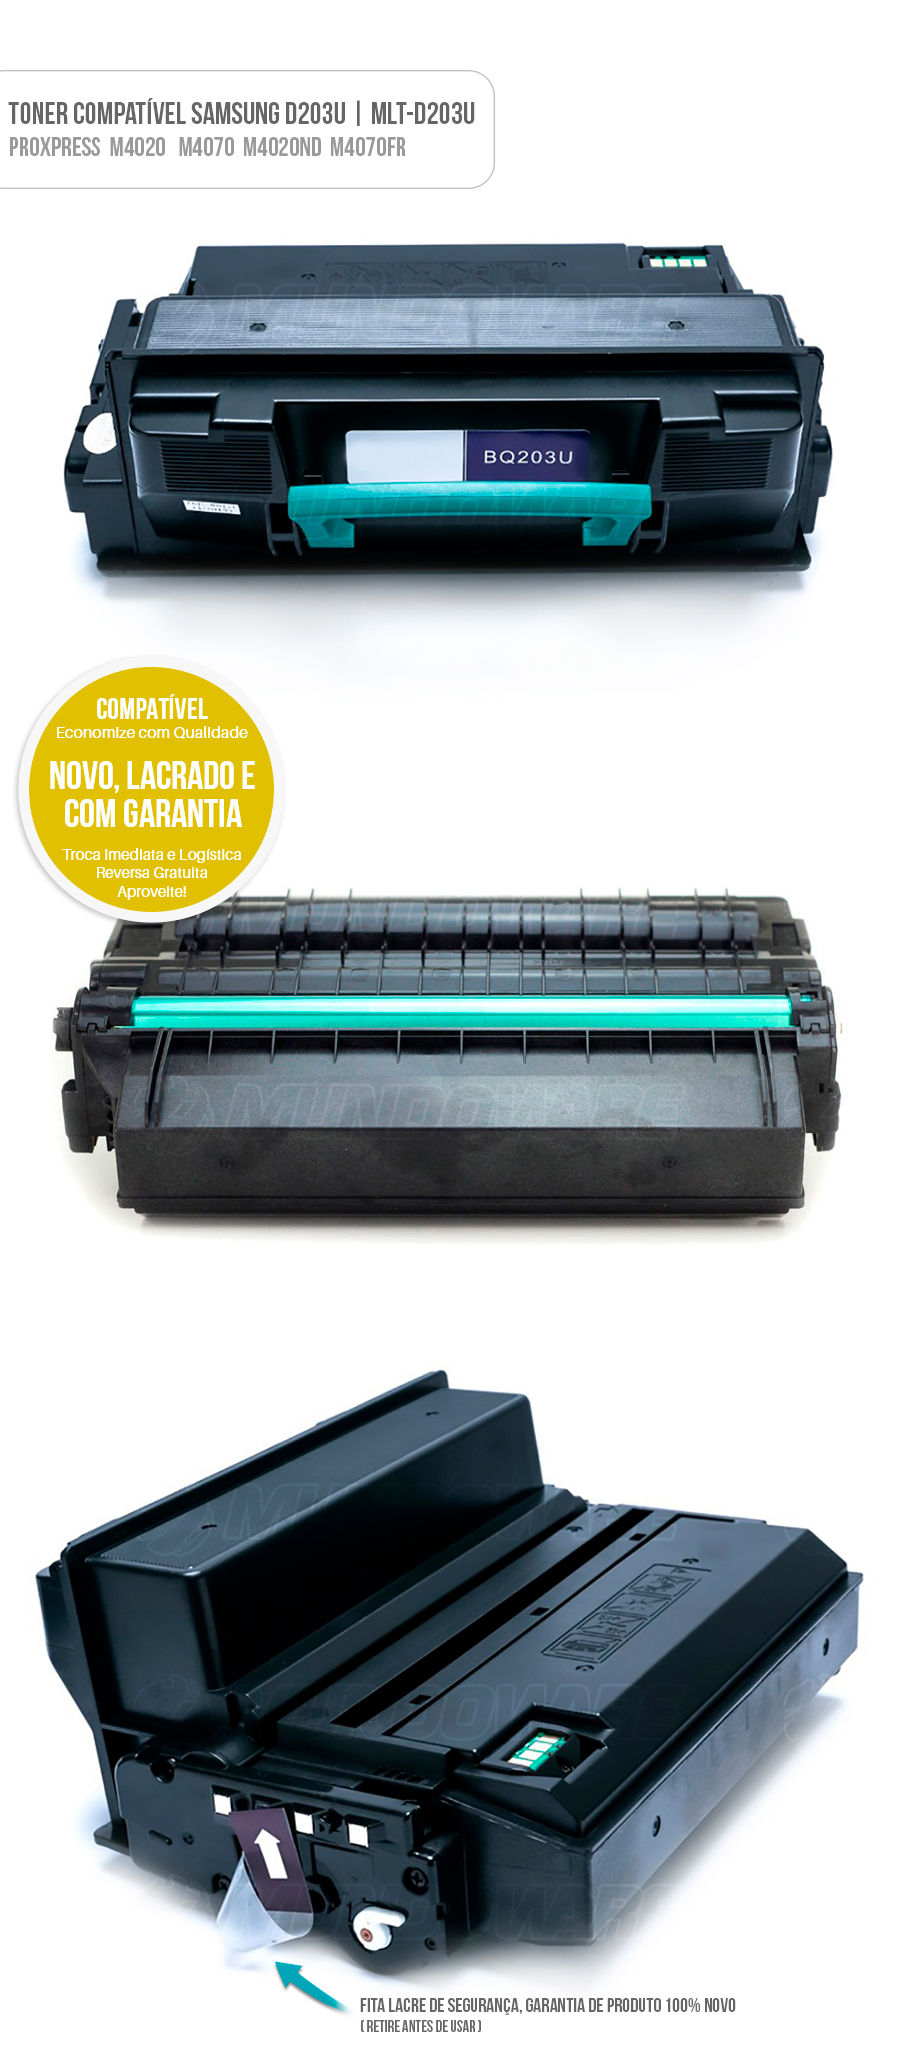 Toner para impressora ProXpress M4020ND M4070FR M4020 M4070 4020 4070 Tonner